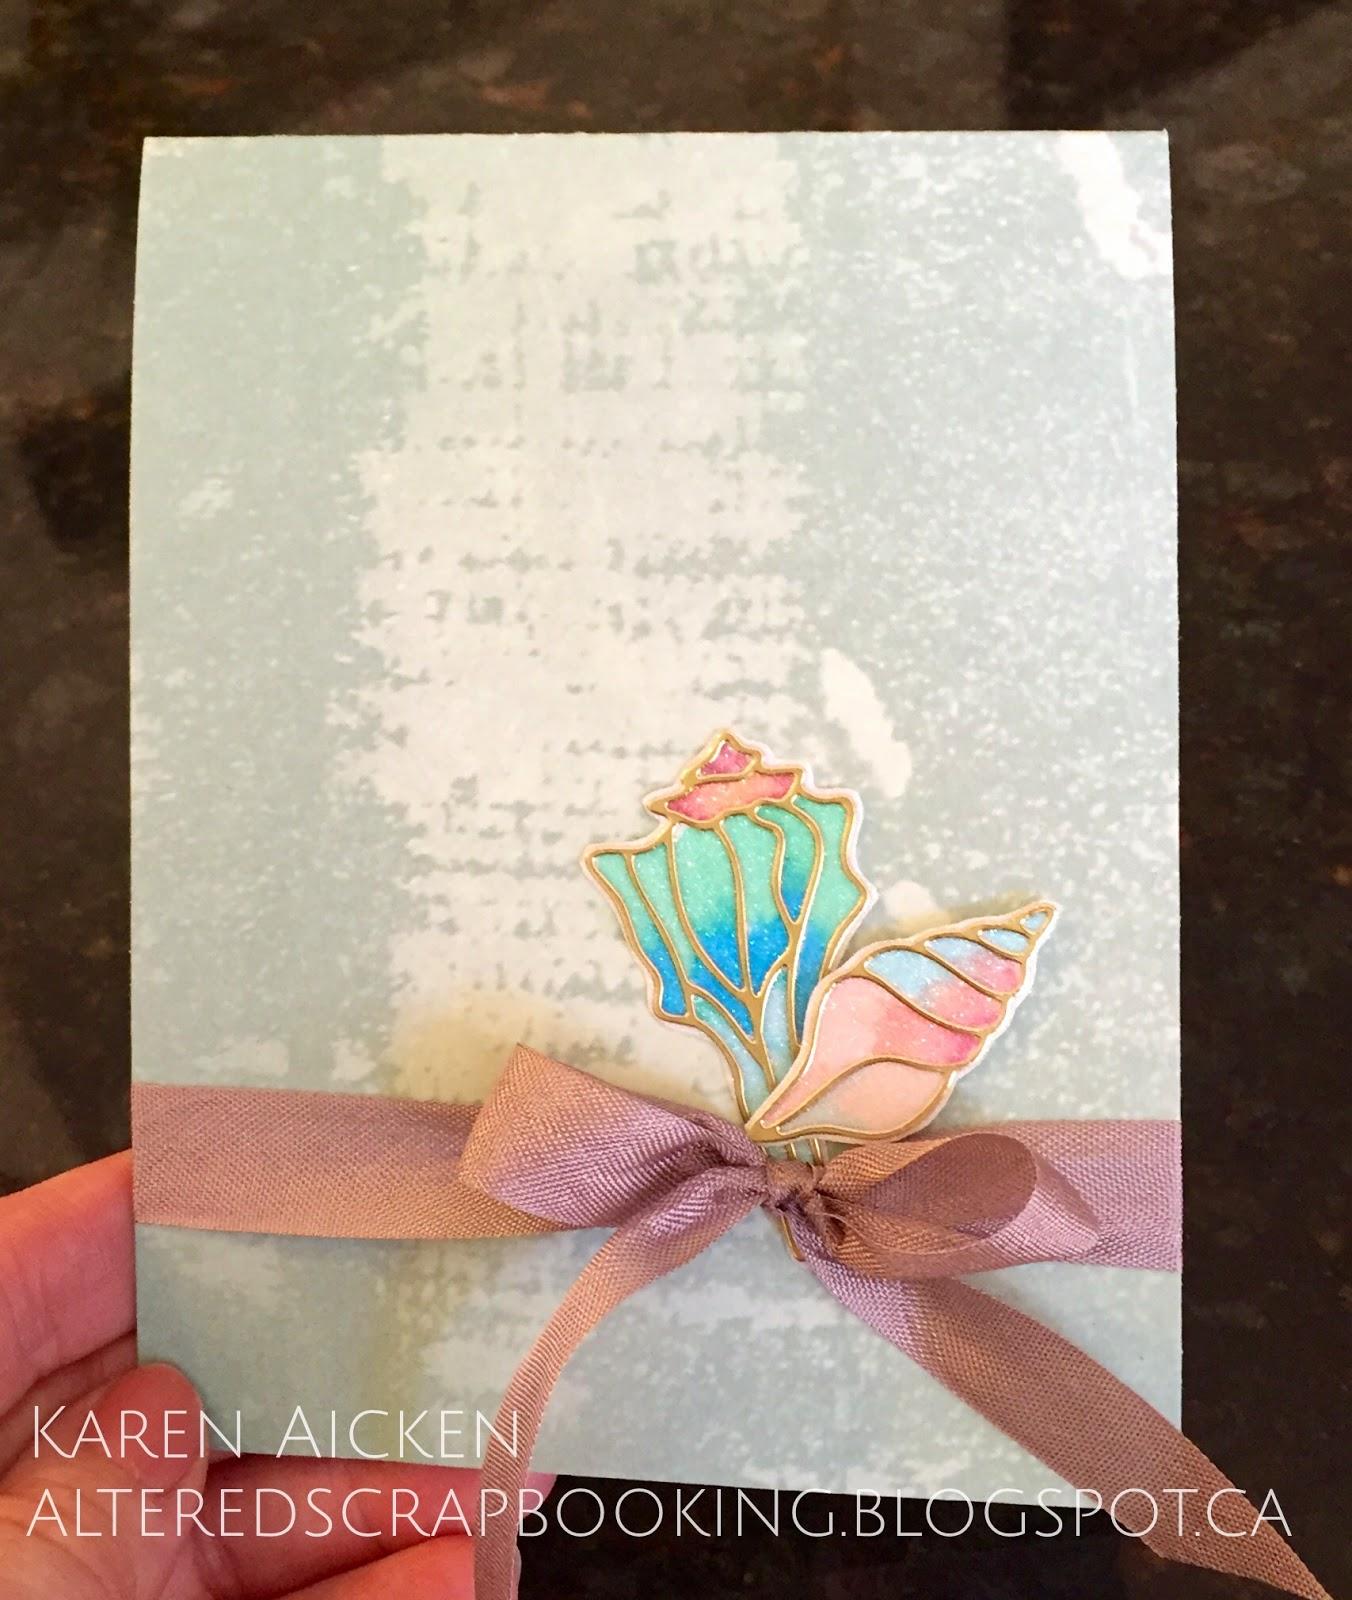 Altered Scrapbooking: Beach Themed Wedding Card